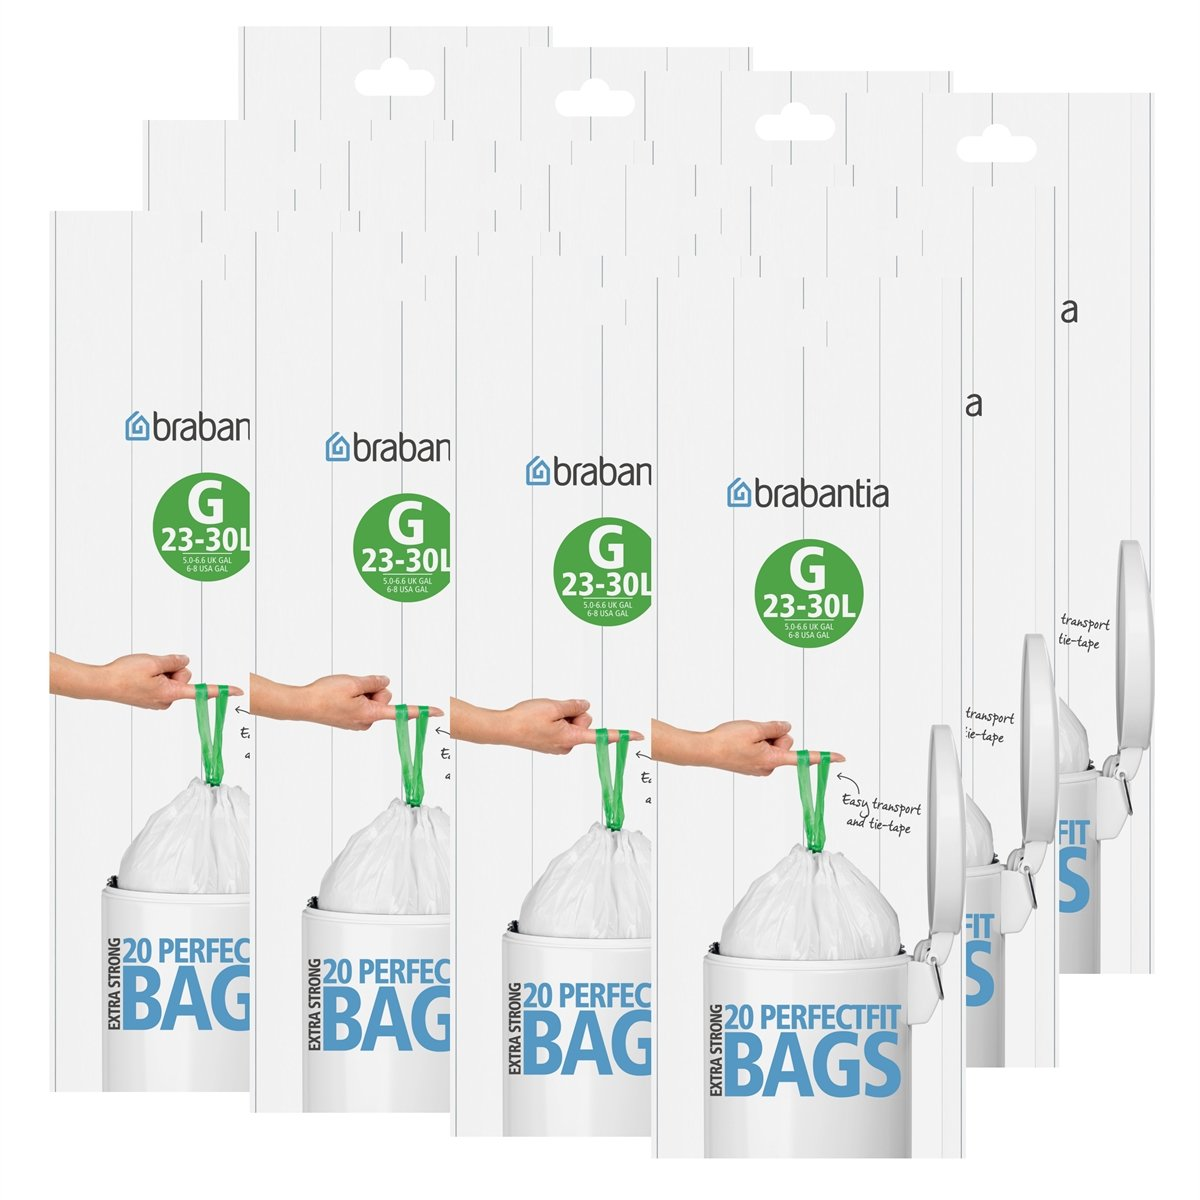 Brabantia Size G 30 Litre Bin Liners (3 Pack)